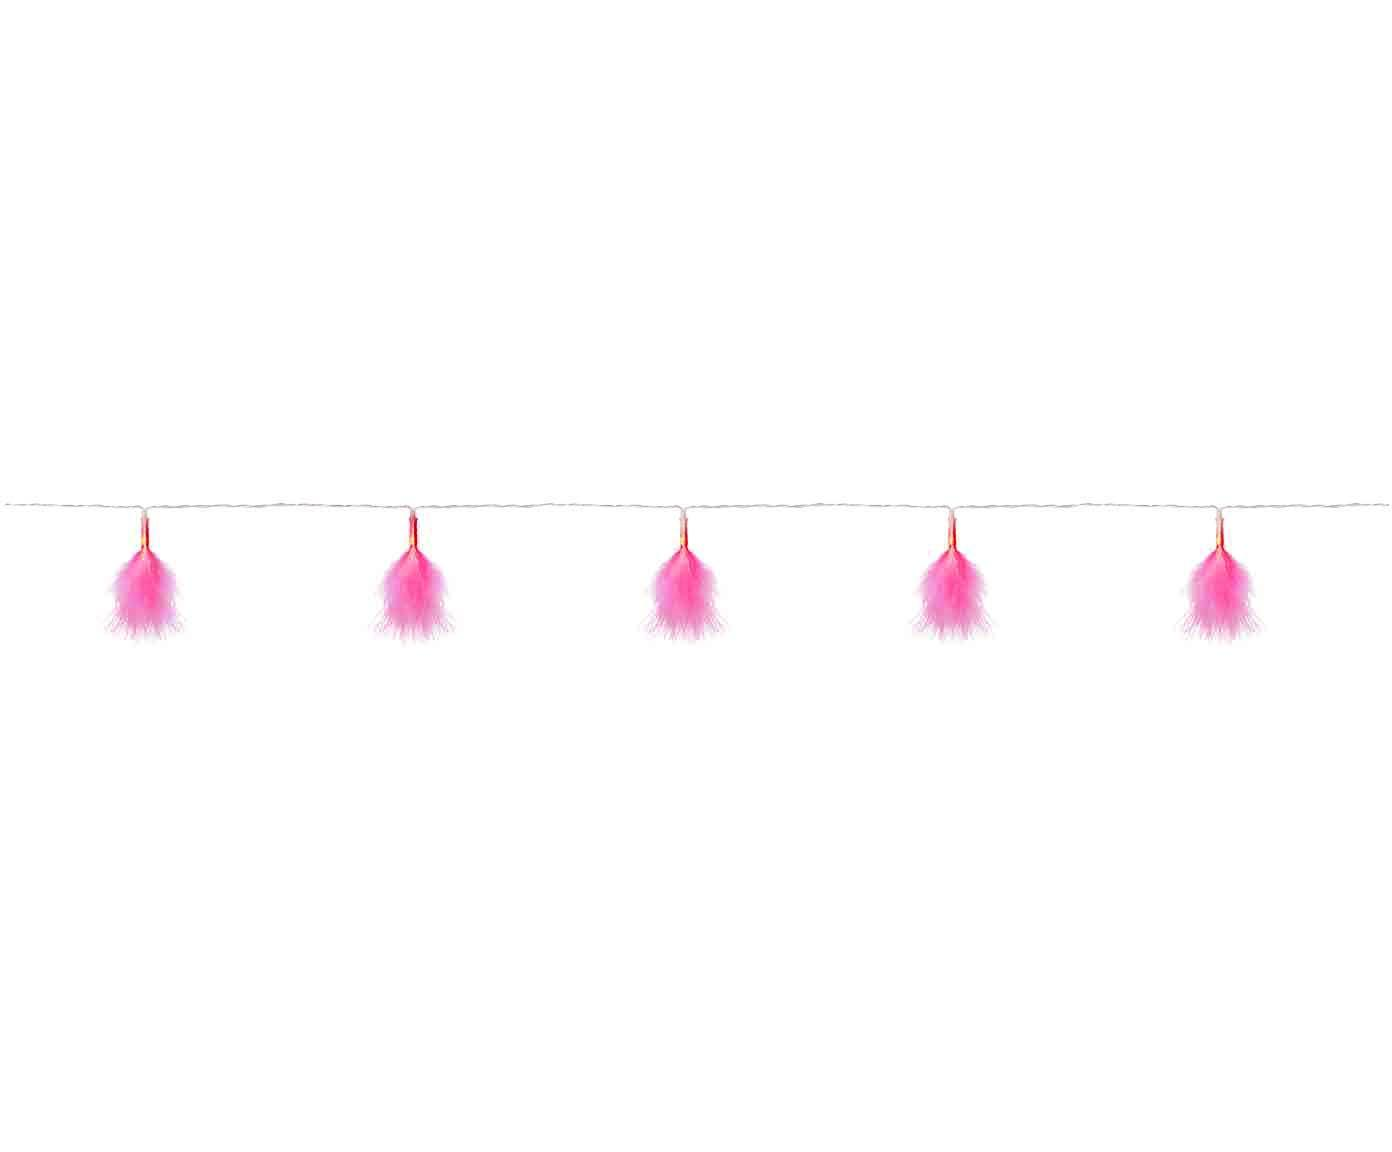 Ghirlanda a LED Dun, Materiale sintetico, poliestere, Rosa trasparente, Lung. 270 cm